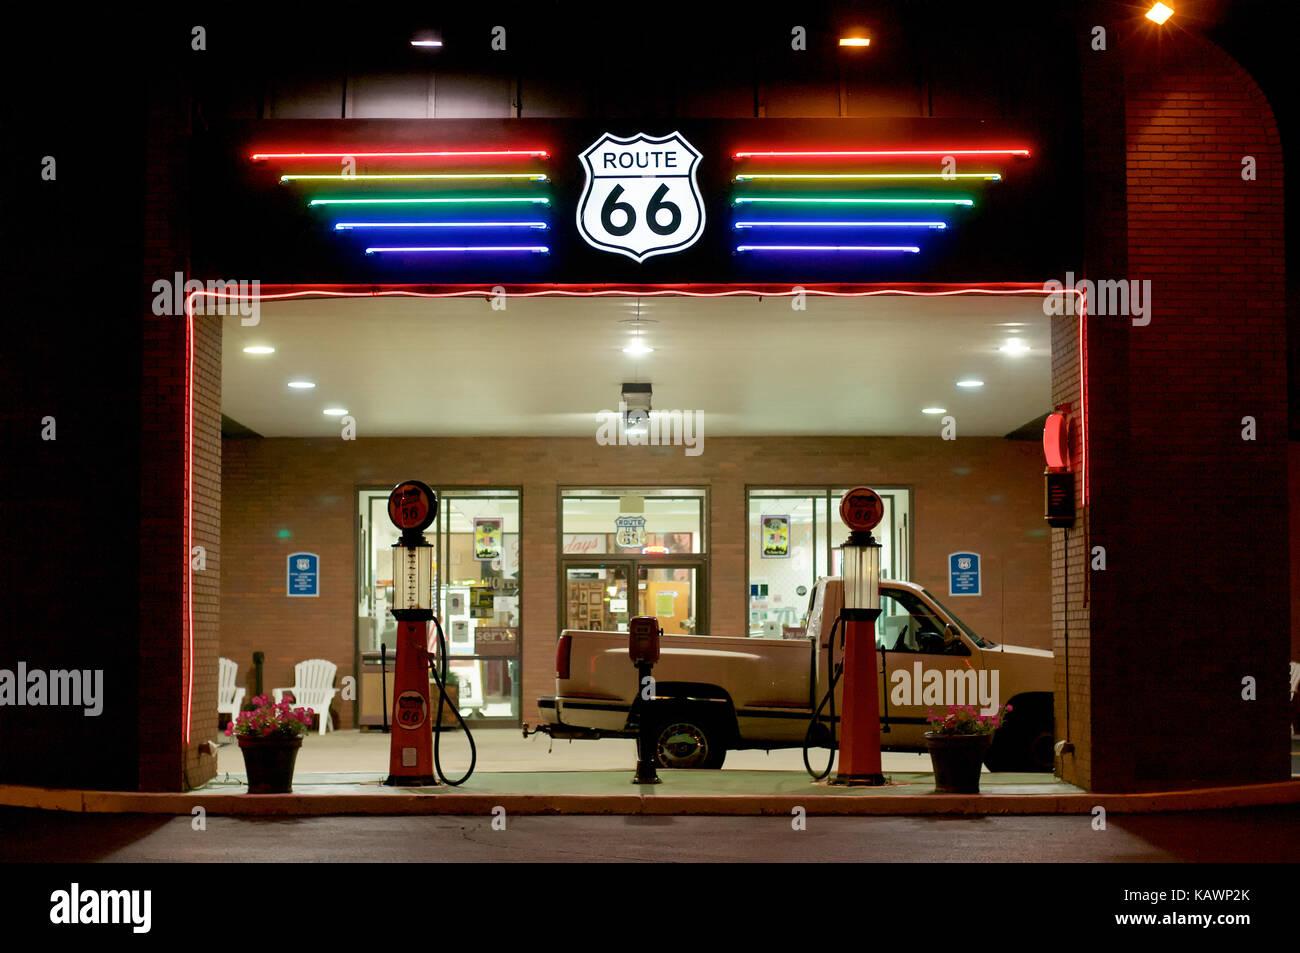 illuminated sign at route 66 hotel in springfield, illinois, usa